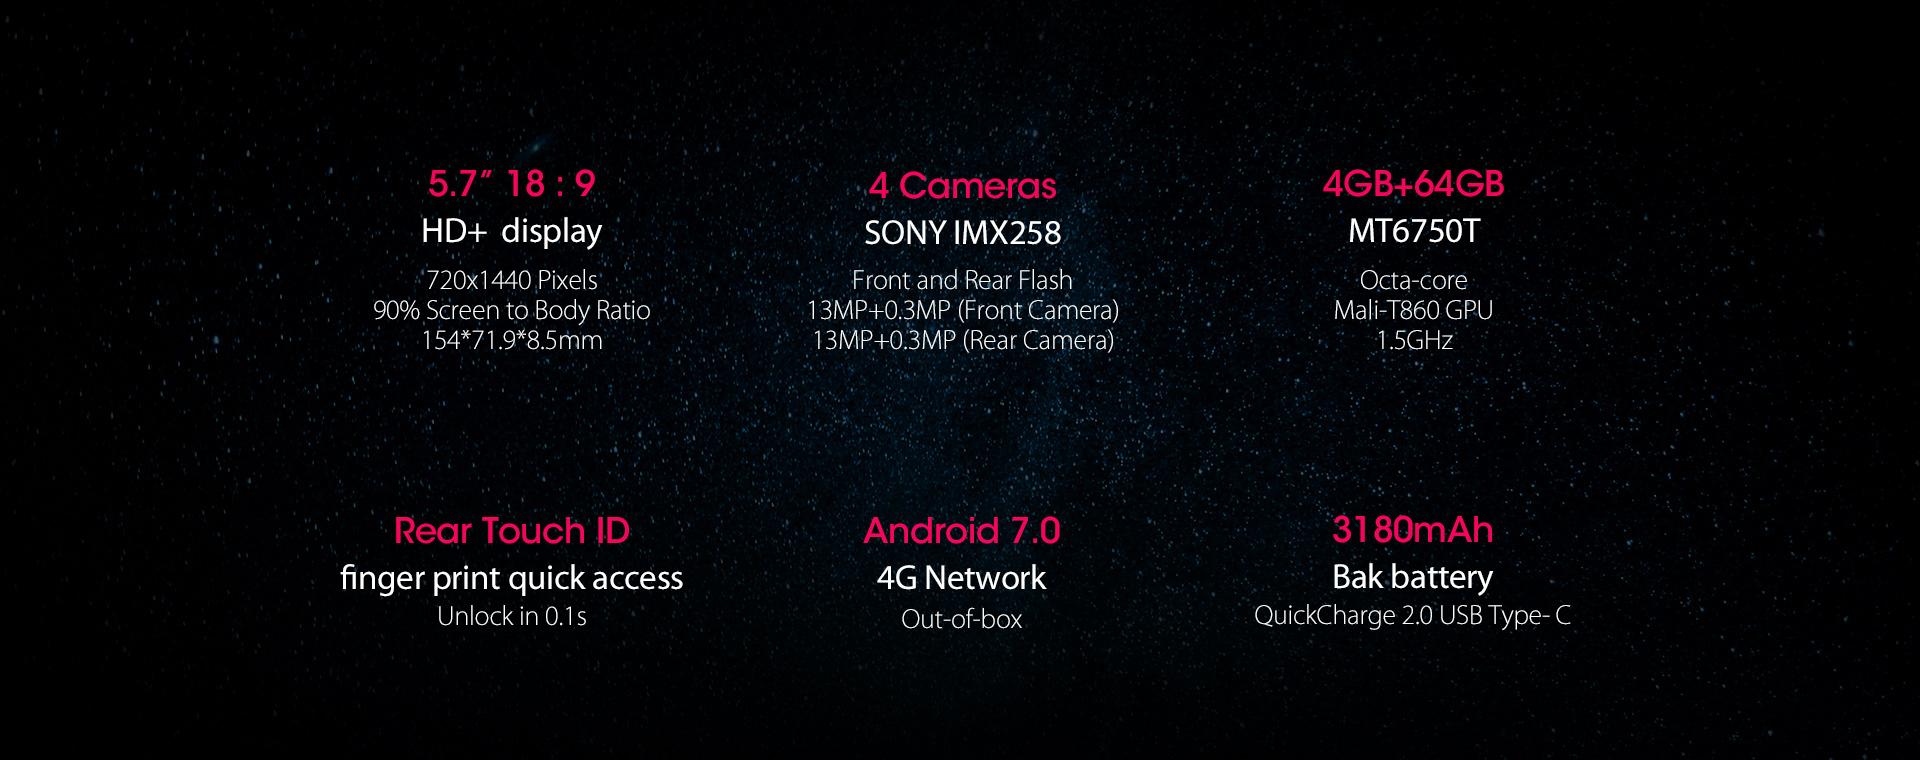 Promotion Blackview S8